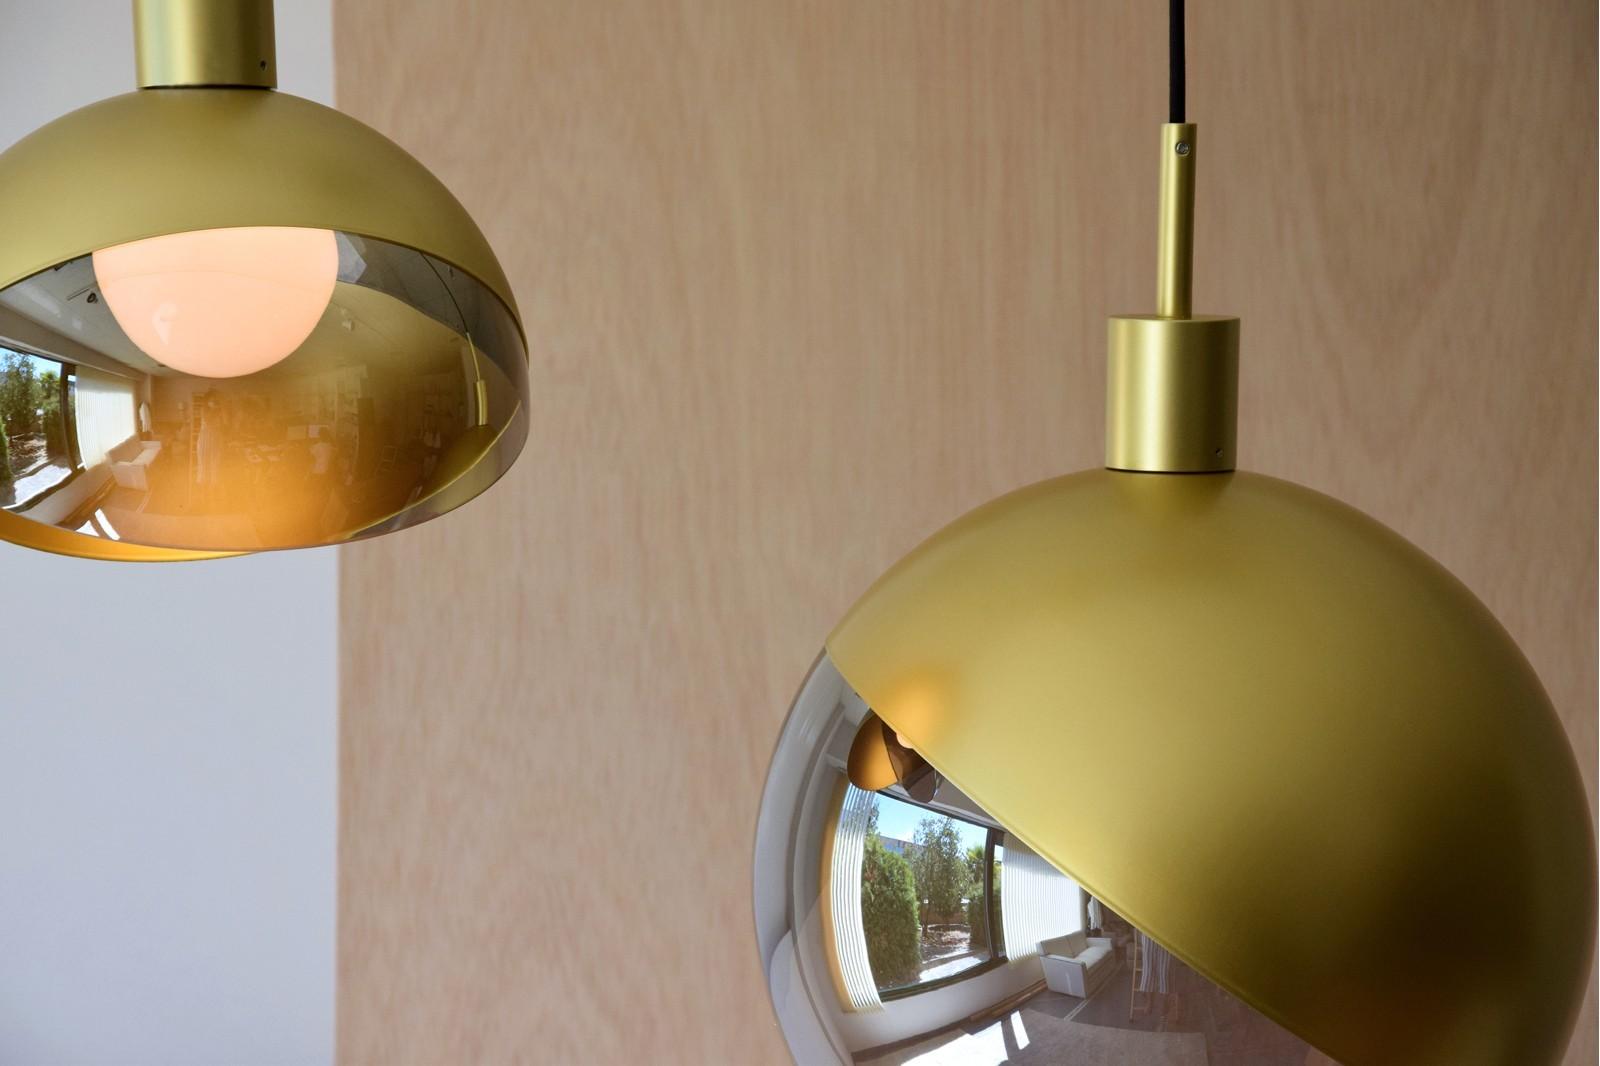 RAILOA CEILING LAMP COLLECTION